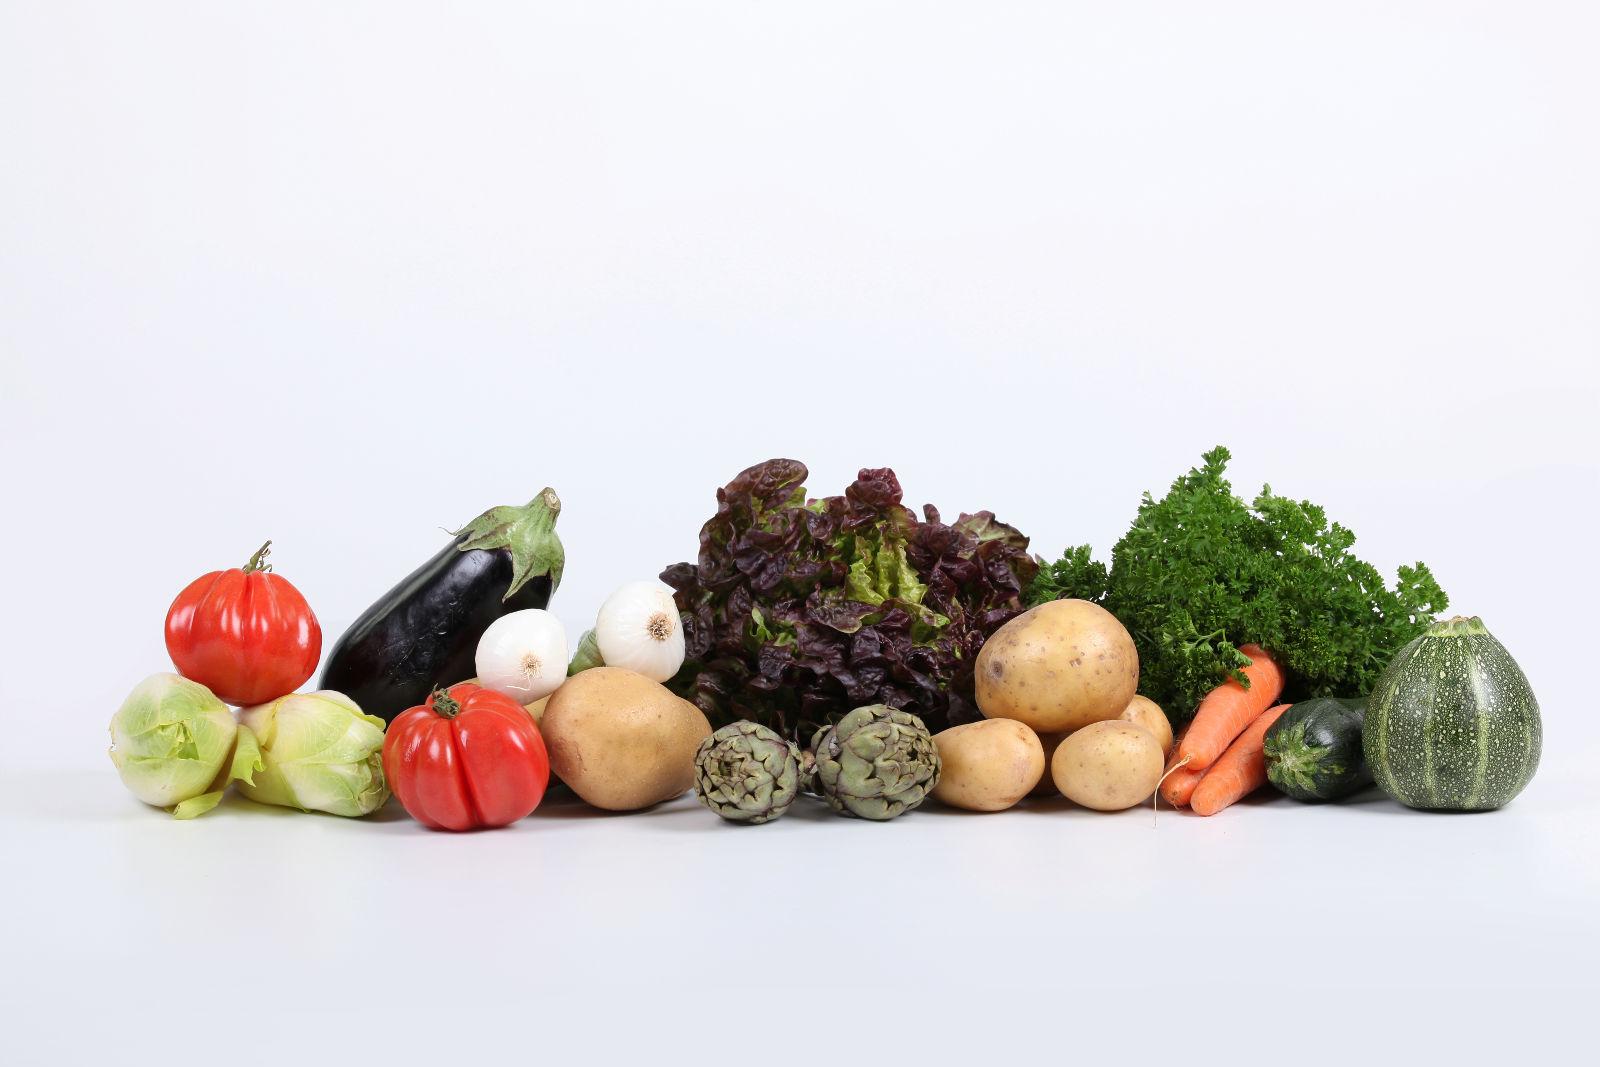 Alimentos ecológicos: ¿todo vale?